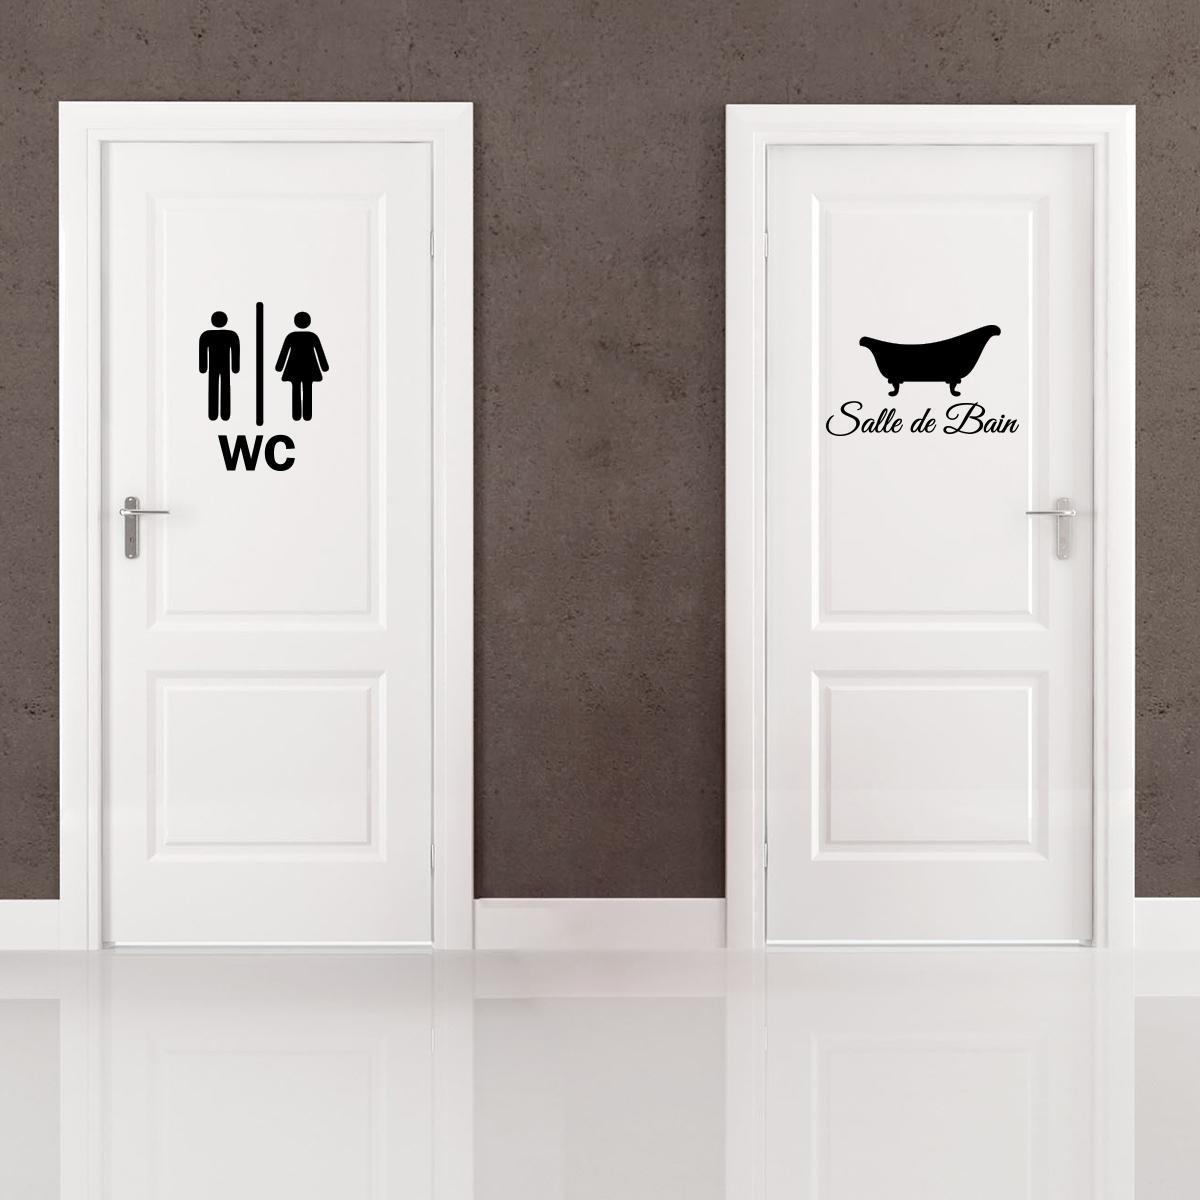 Sticker porte salle de bain et wc stickers salle de bain - Porte coulissante salle de bains ...